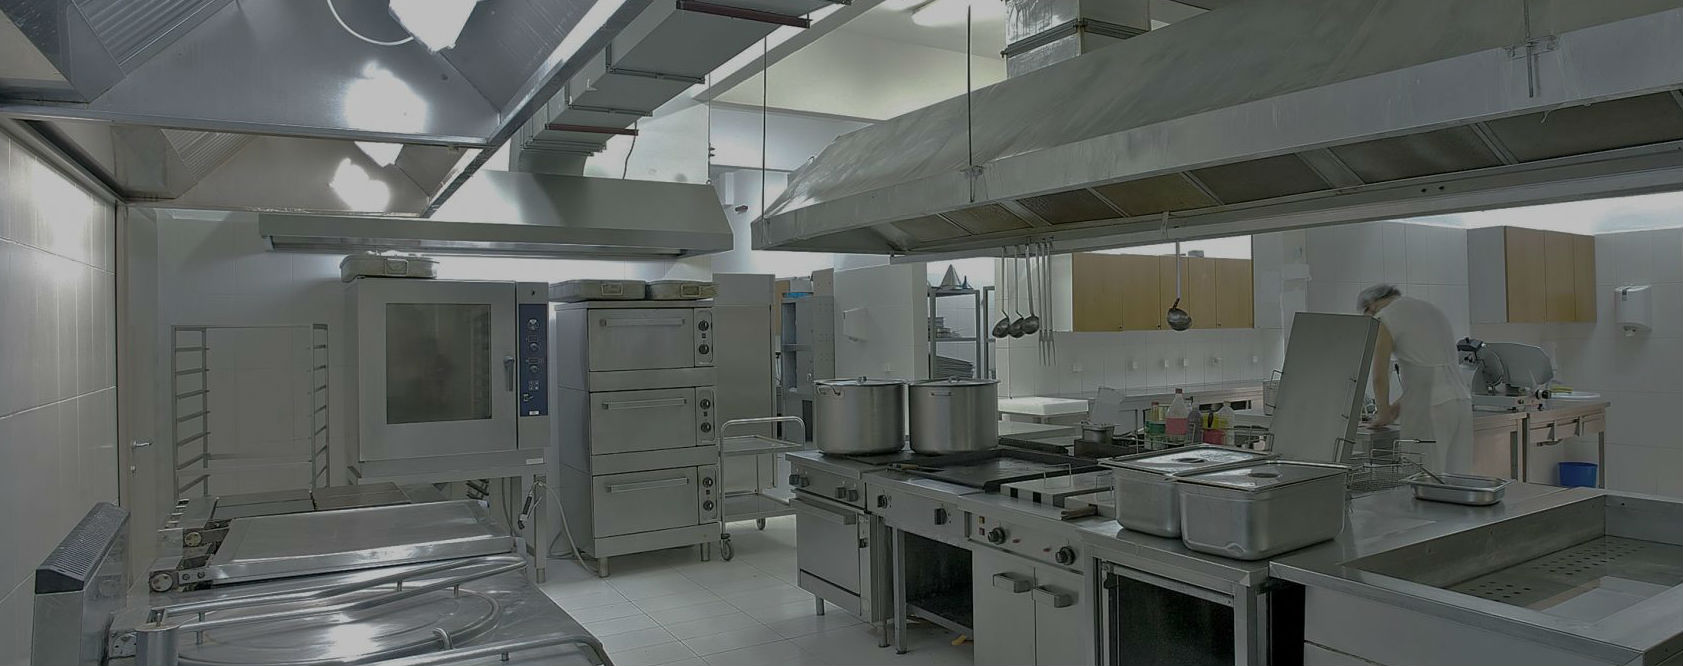 Exhaust Ventilation System